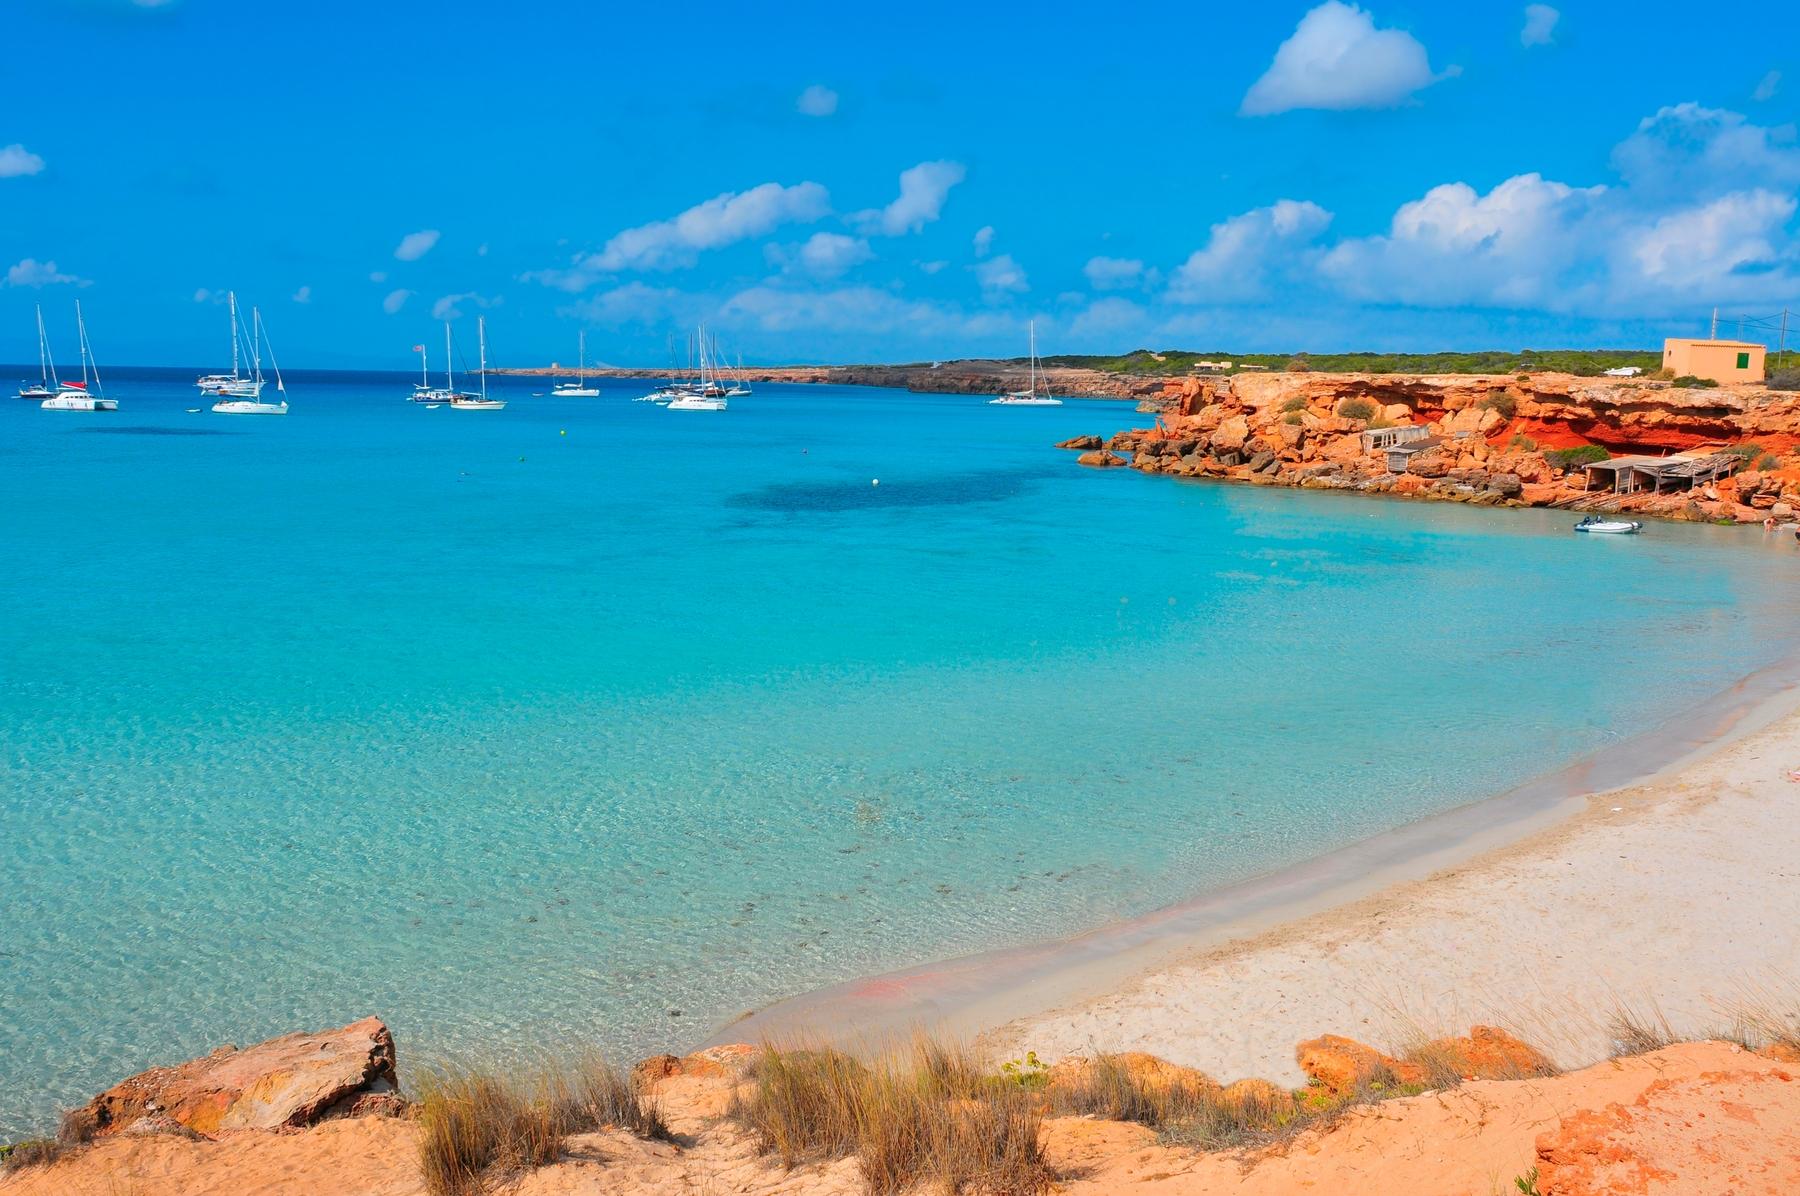 Spiagge Formentera: Es Arenals